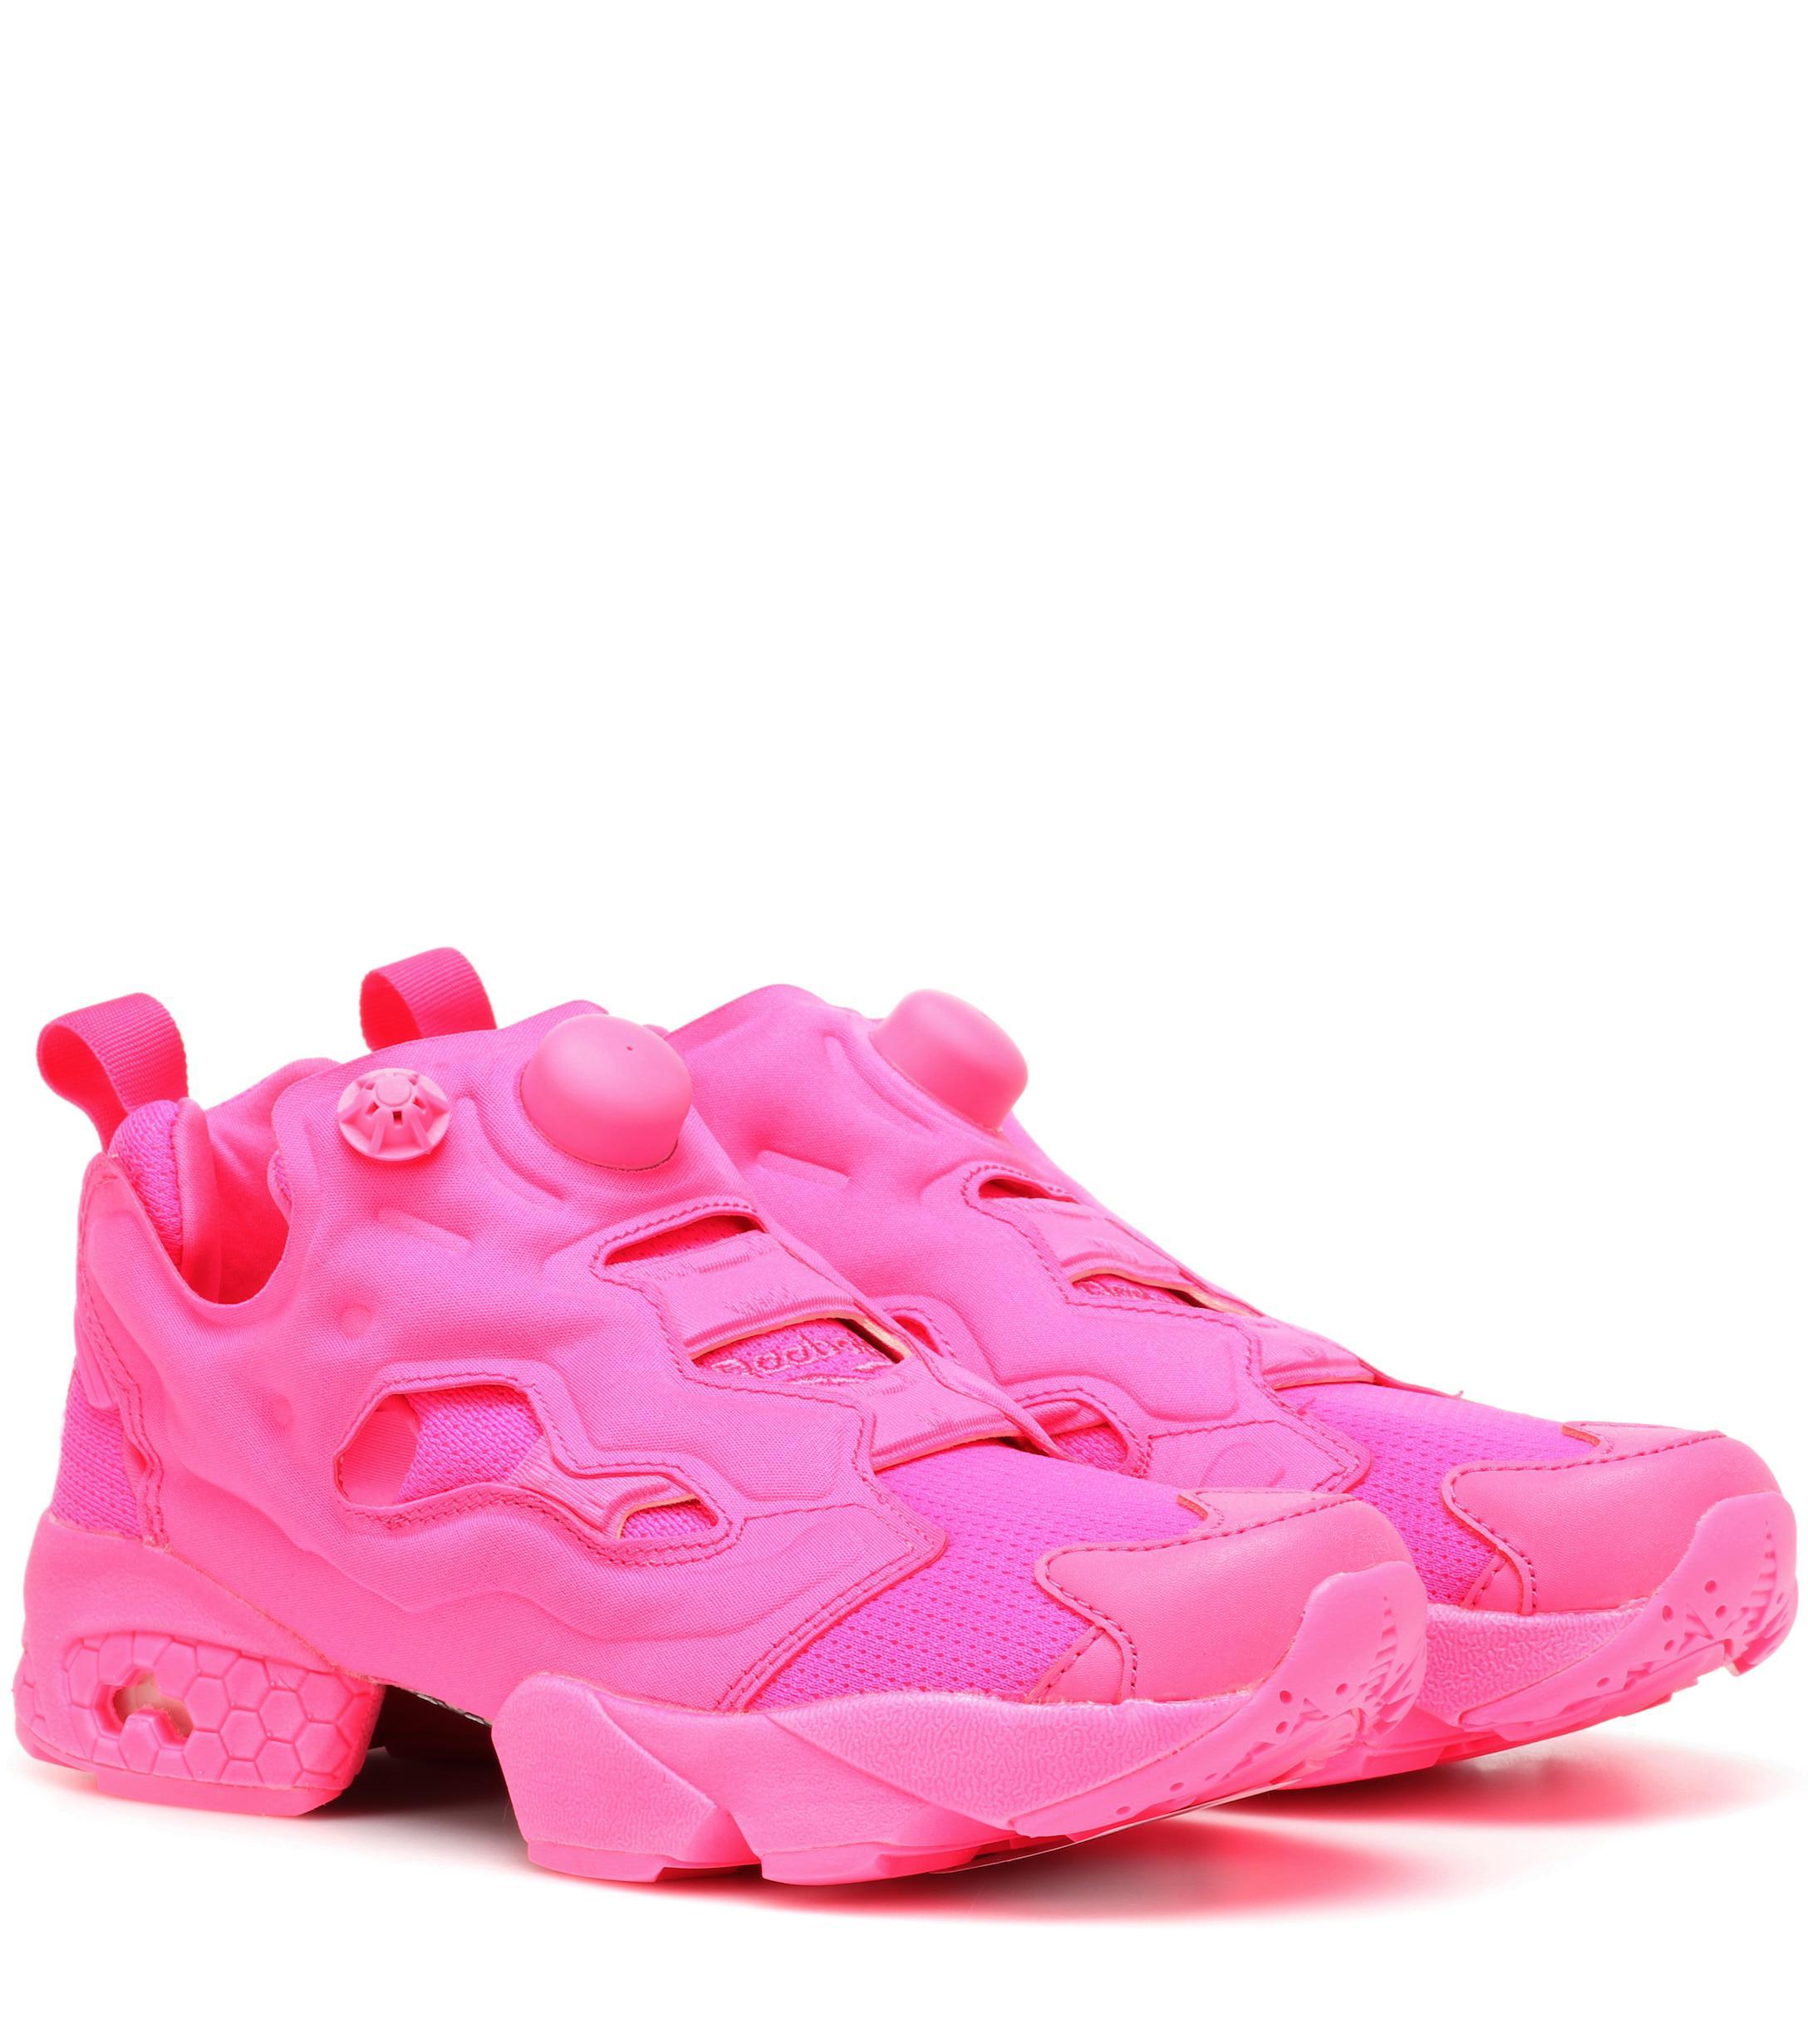 ae56e6a3860 Vetements X Reebok Instapump Fury Sneakers in Pink - Lyst